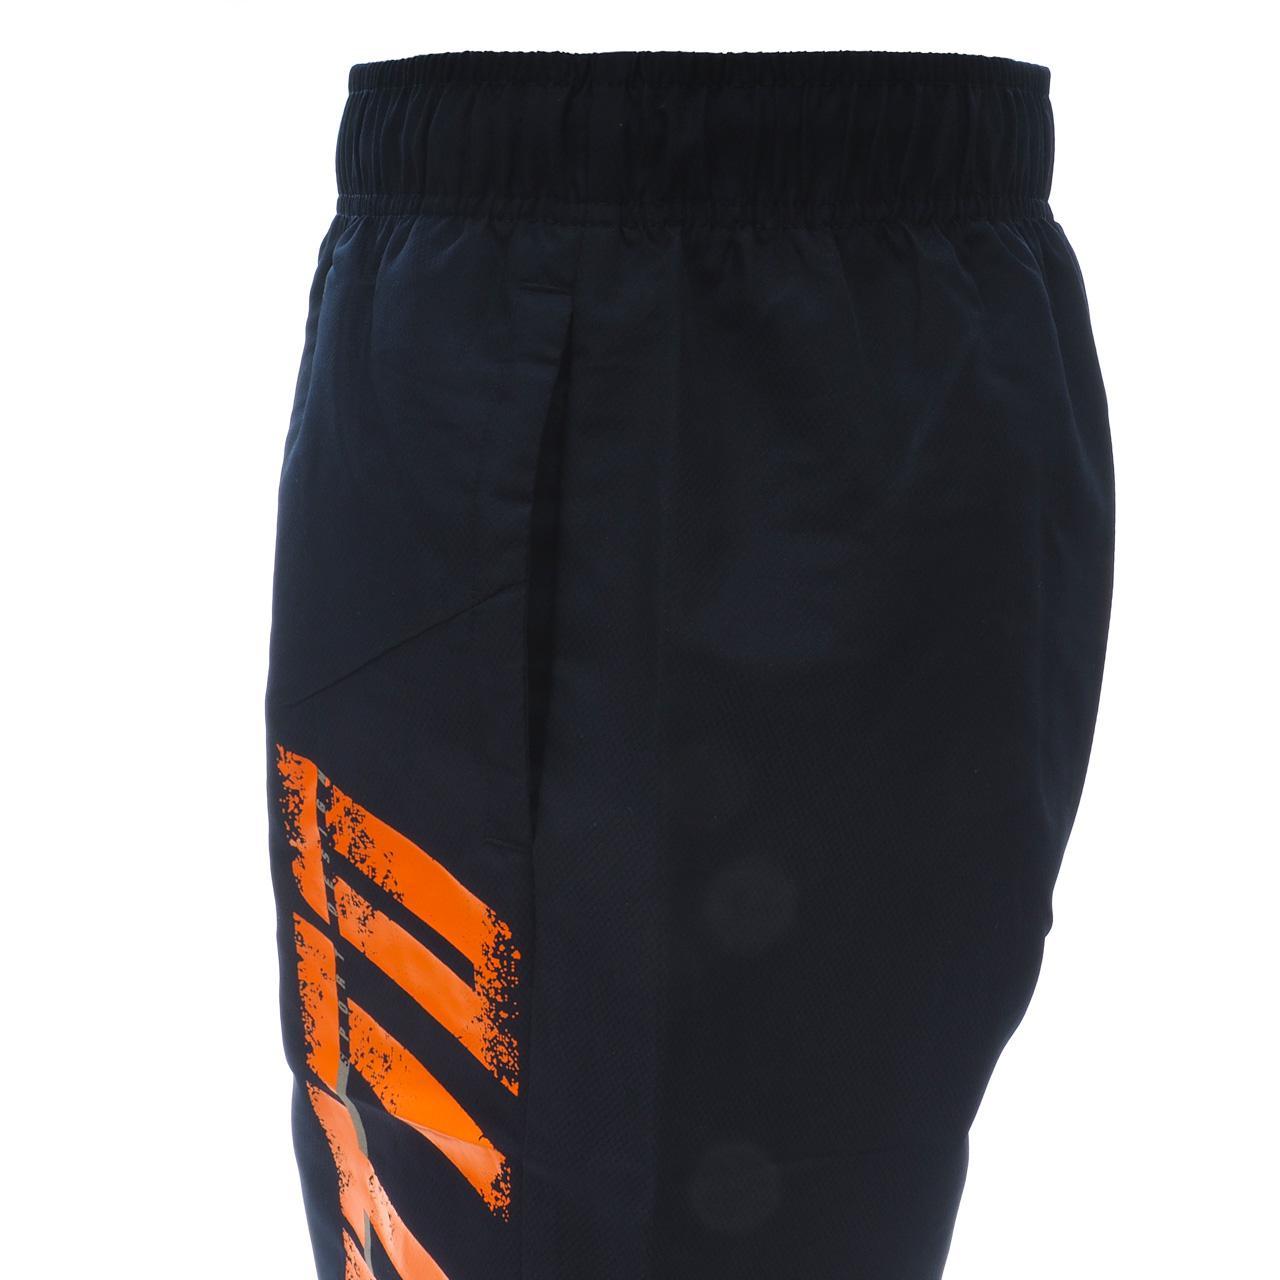 Bermuda-Shorts-Lotto-Logo-Navy-Bermuda-Blue-17798-New thumbnail 3